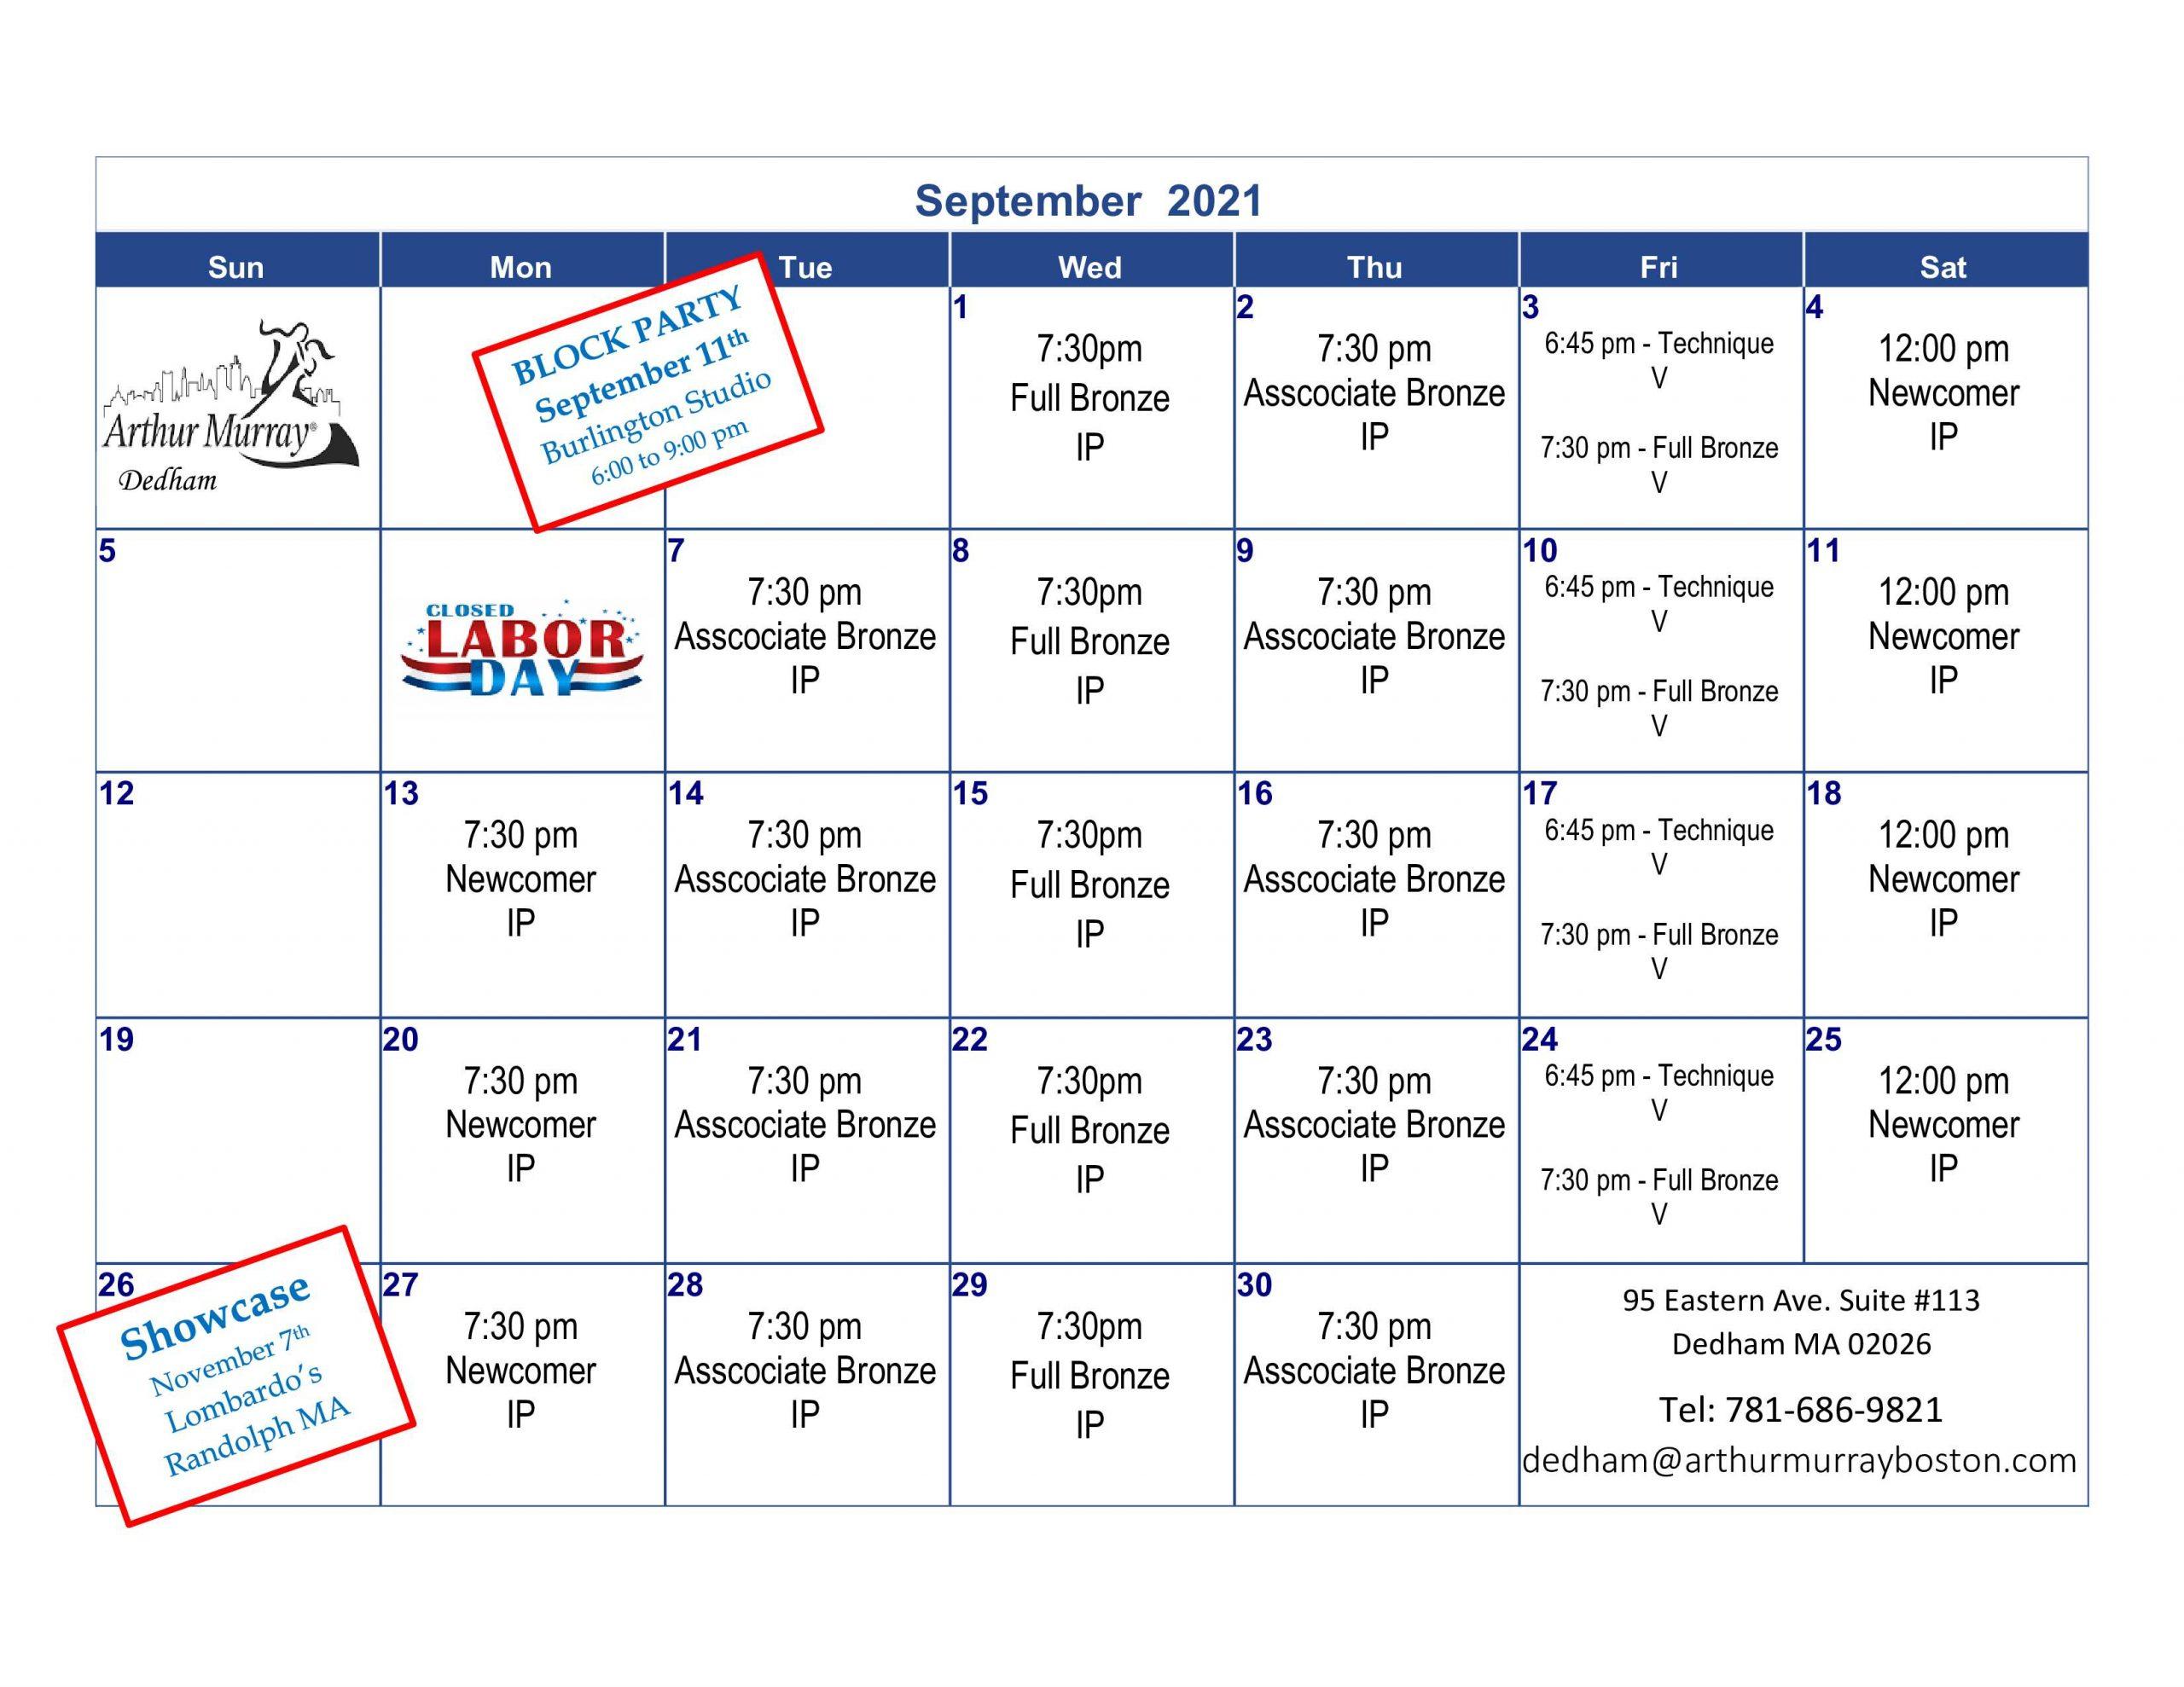 Dance Studio Dedham September Calendar